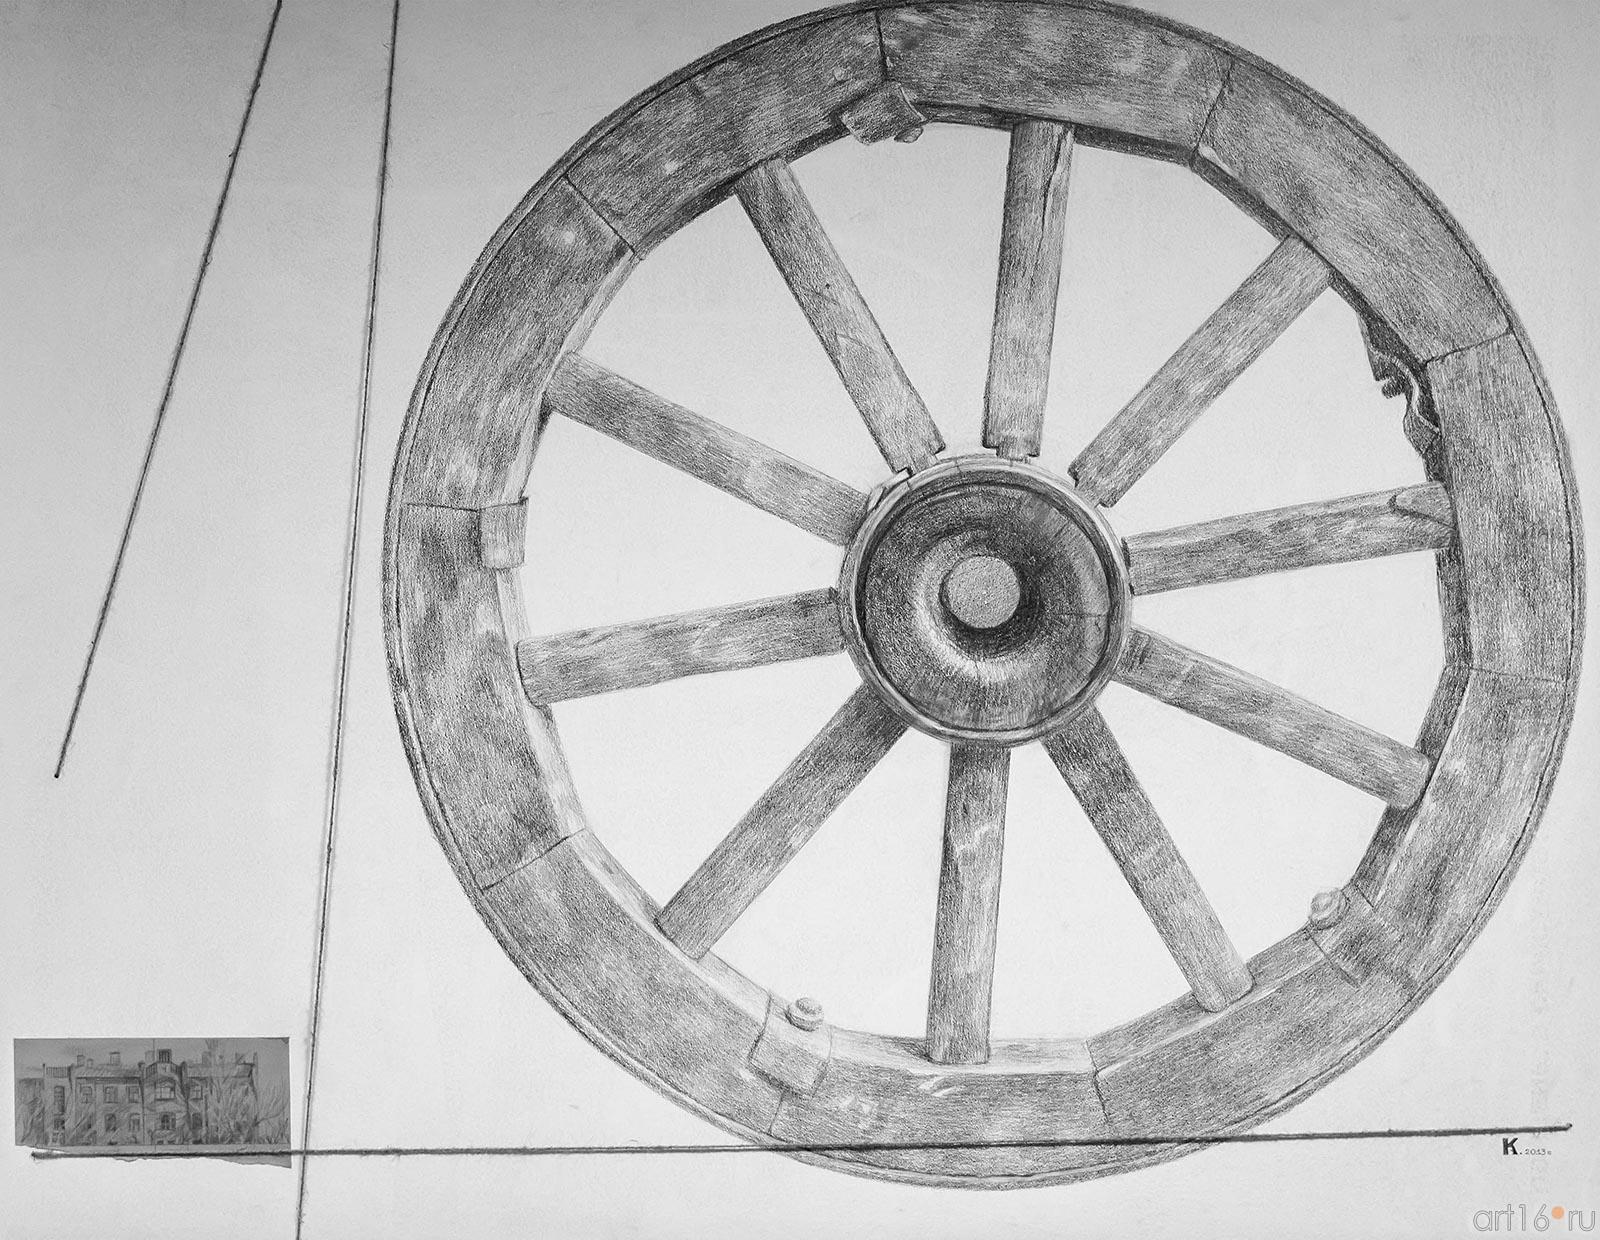 КАРАСЕВА ВЕРА г.Зеленодольск КОЛЕСО. 2013 Пенокартон, карандаш::Про-карандаш